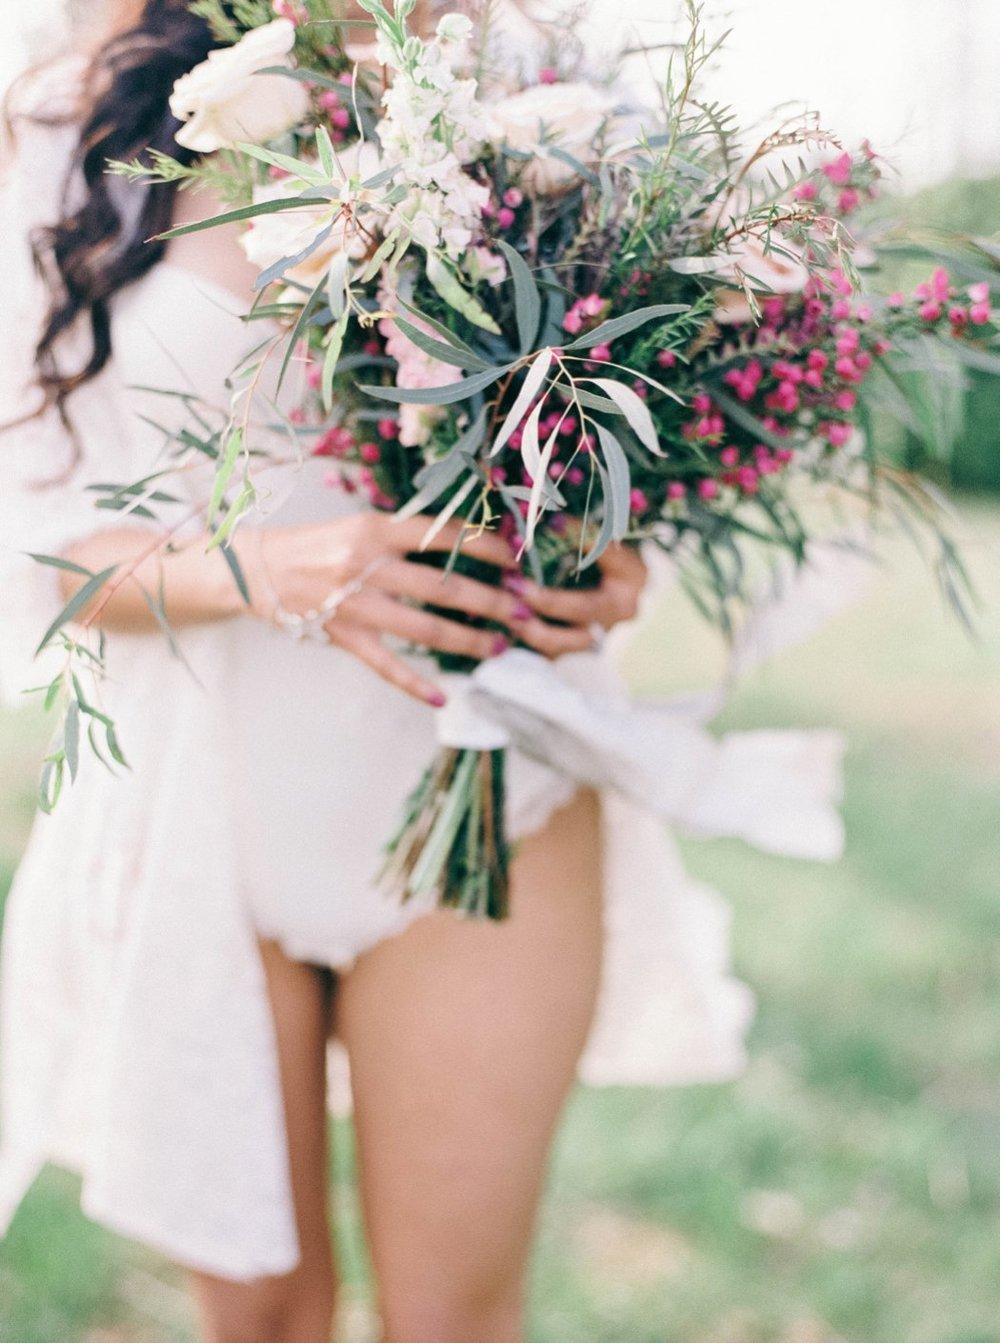 amanda_burnette_richmond_wedding_florist_wedding_organic_flowers_bridal-portrait_boudoir-photo_0004.jpg